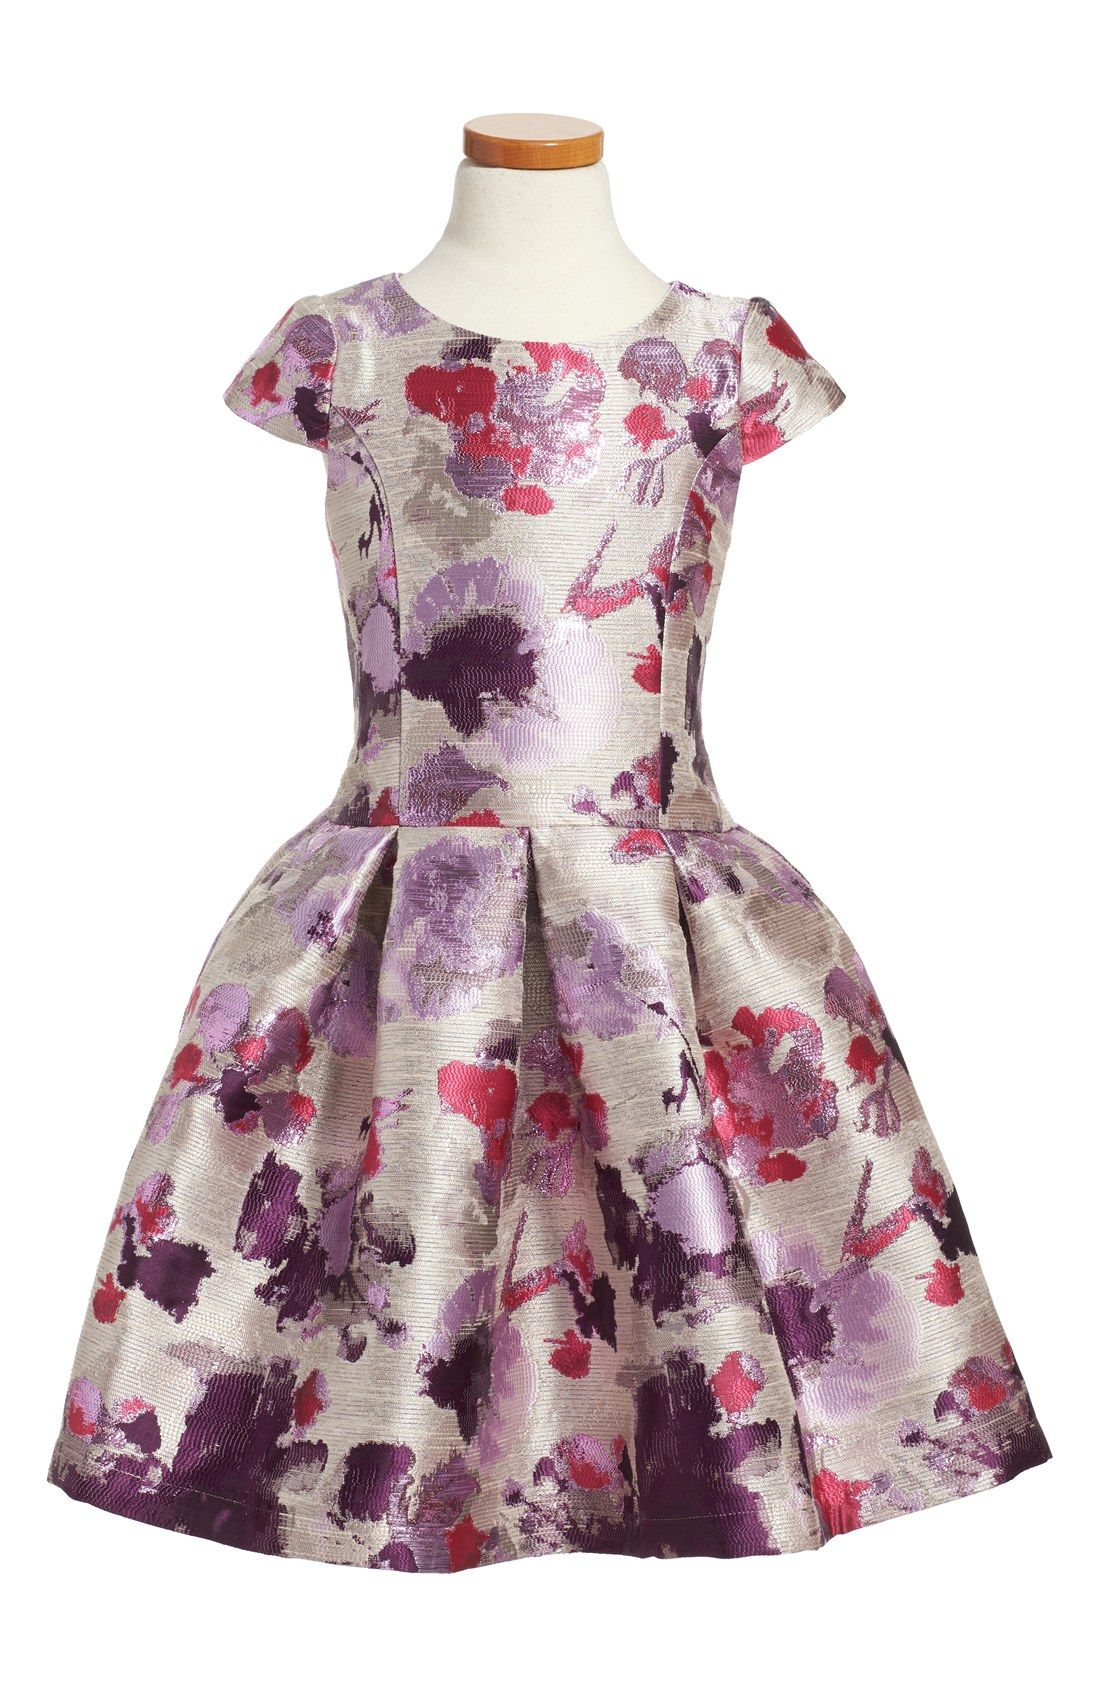 Zoë LTD 'Purple Haze' Floral Print Cap Sleeve Brocade Dress (Big Girls) #easter #party #birthday #wedding #tween #teen